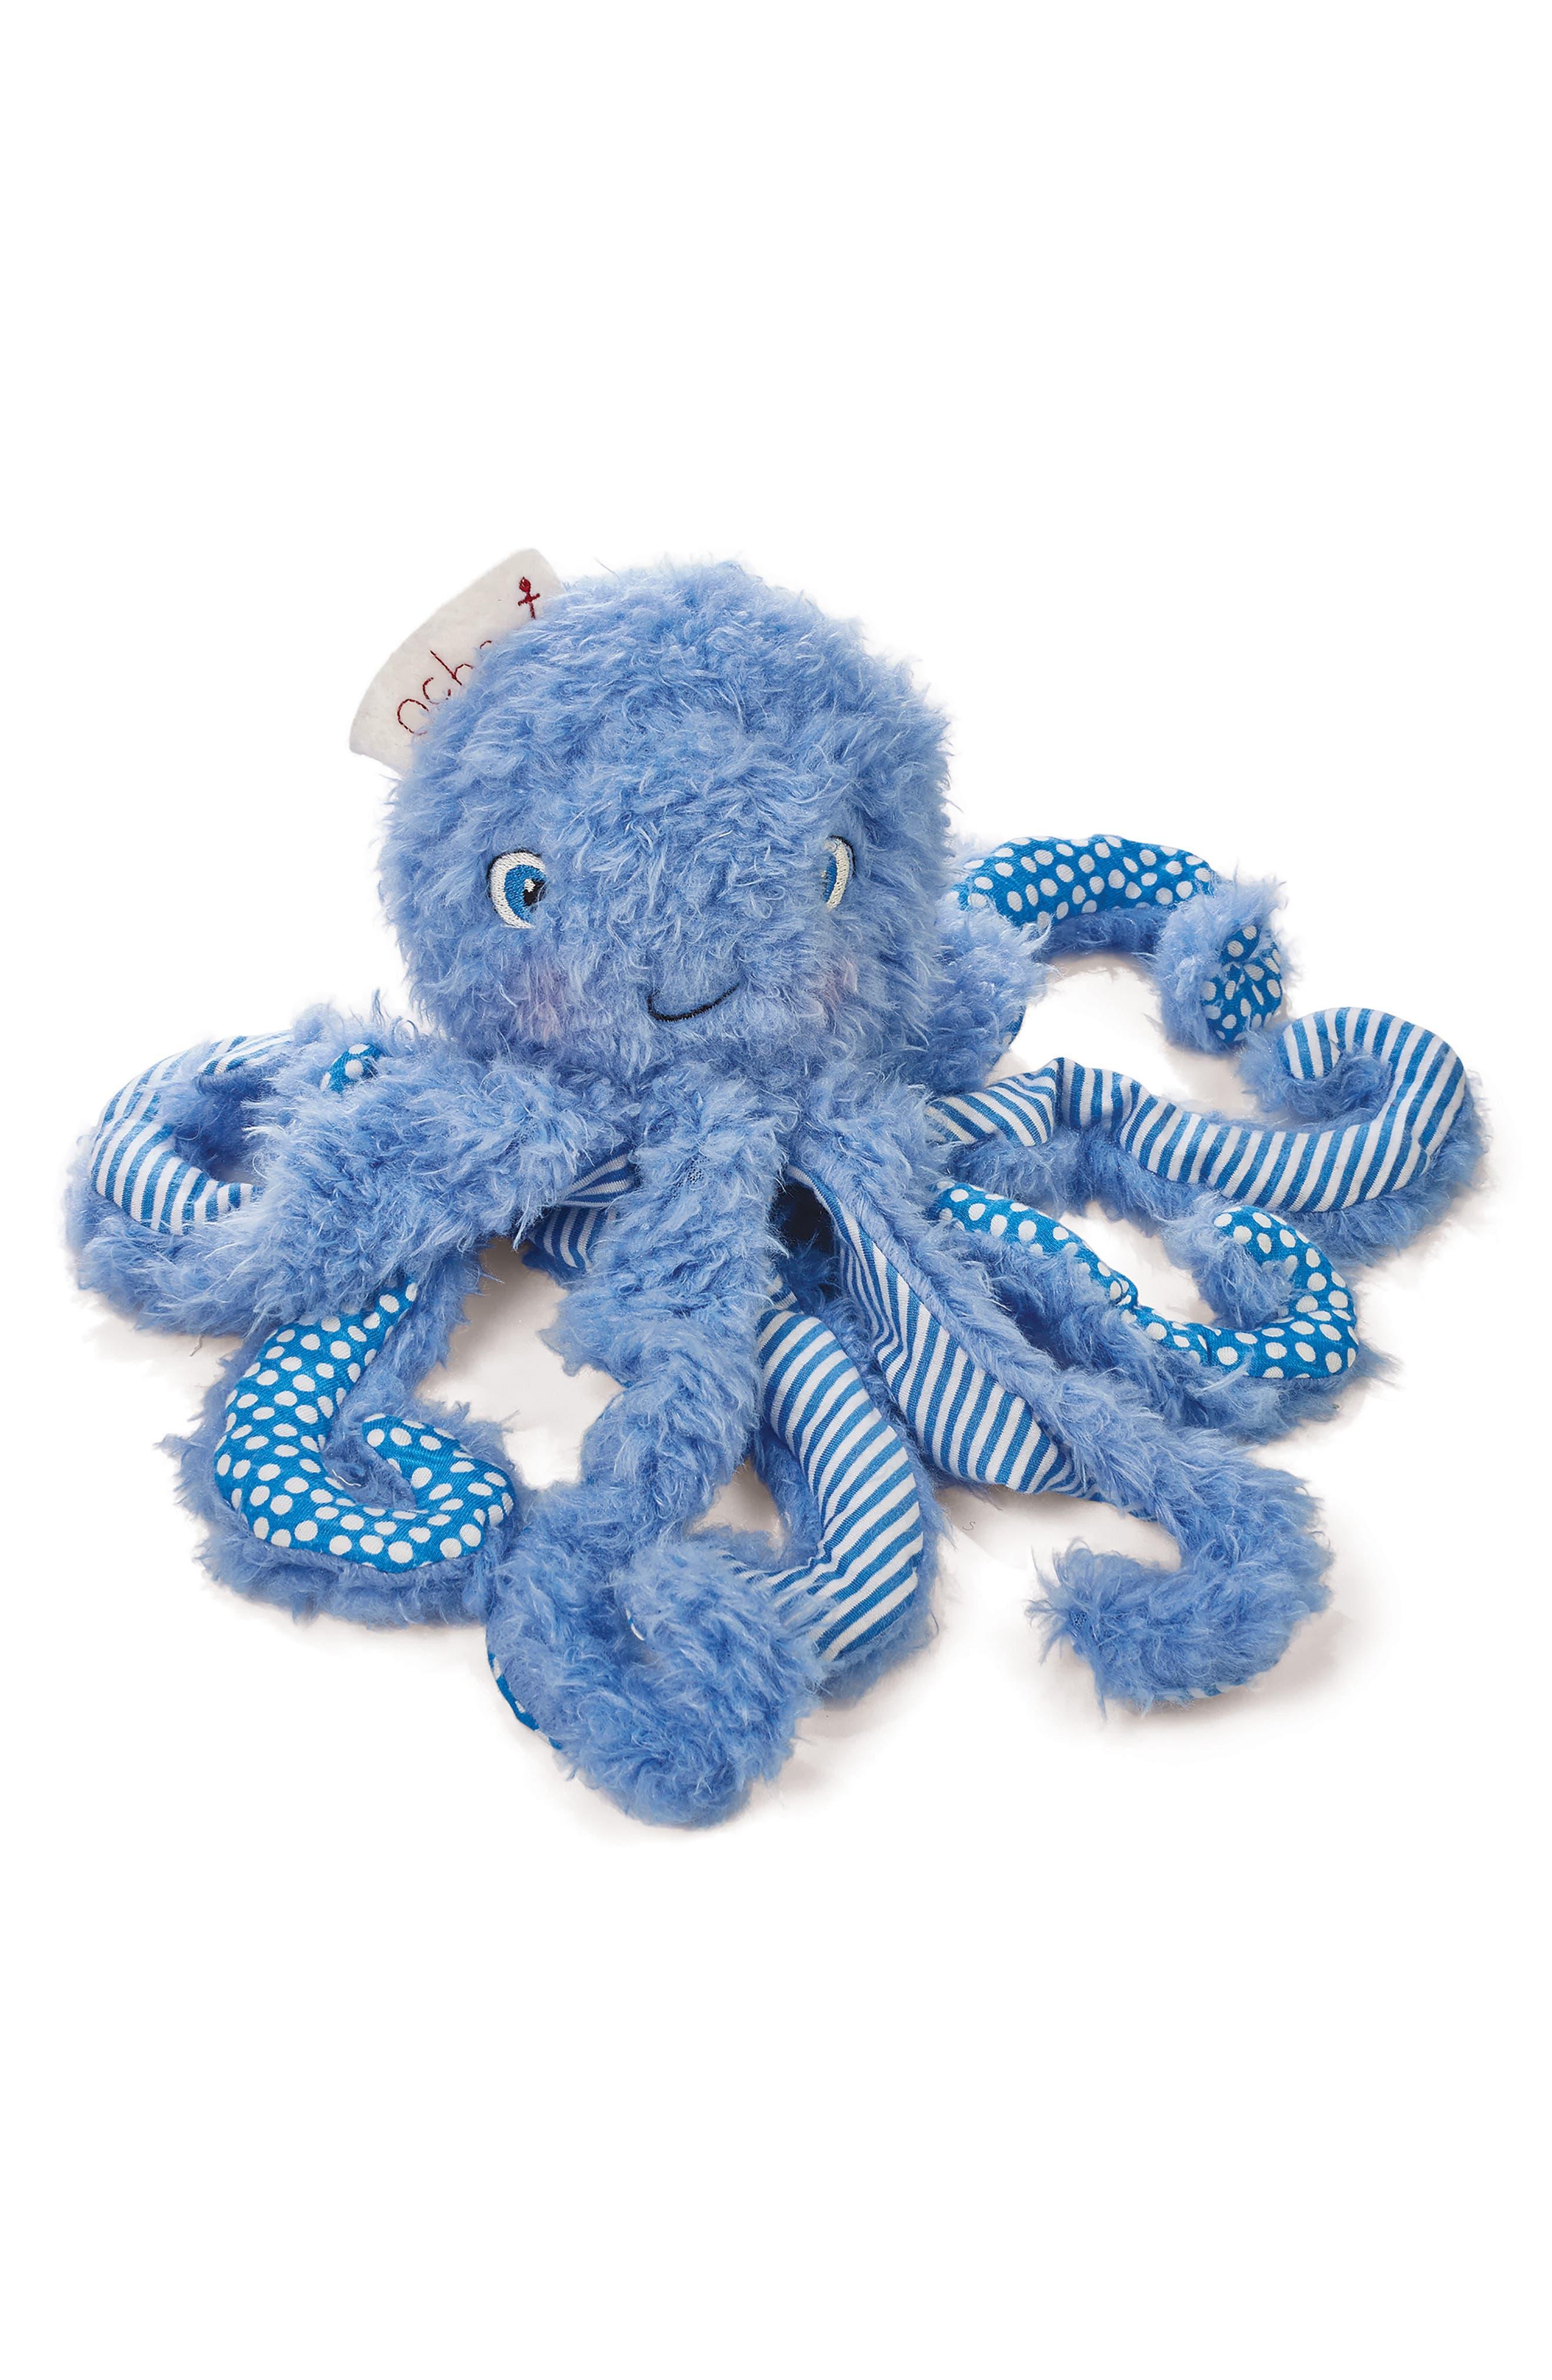 Ocho Octopus Stuffed Animal,                             Main thumbnail 1, color,                             420